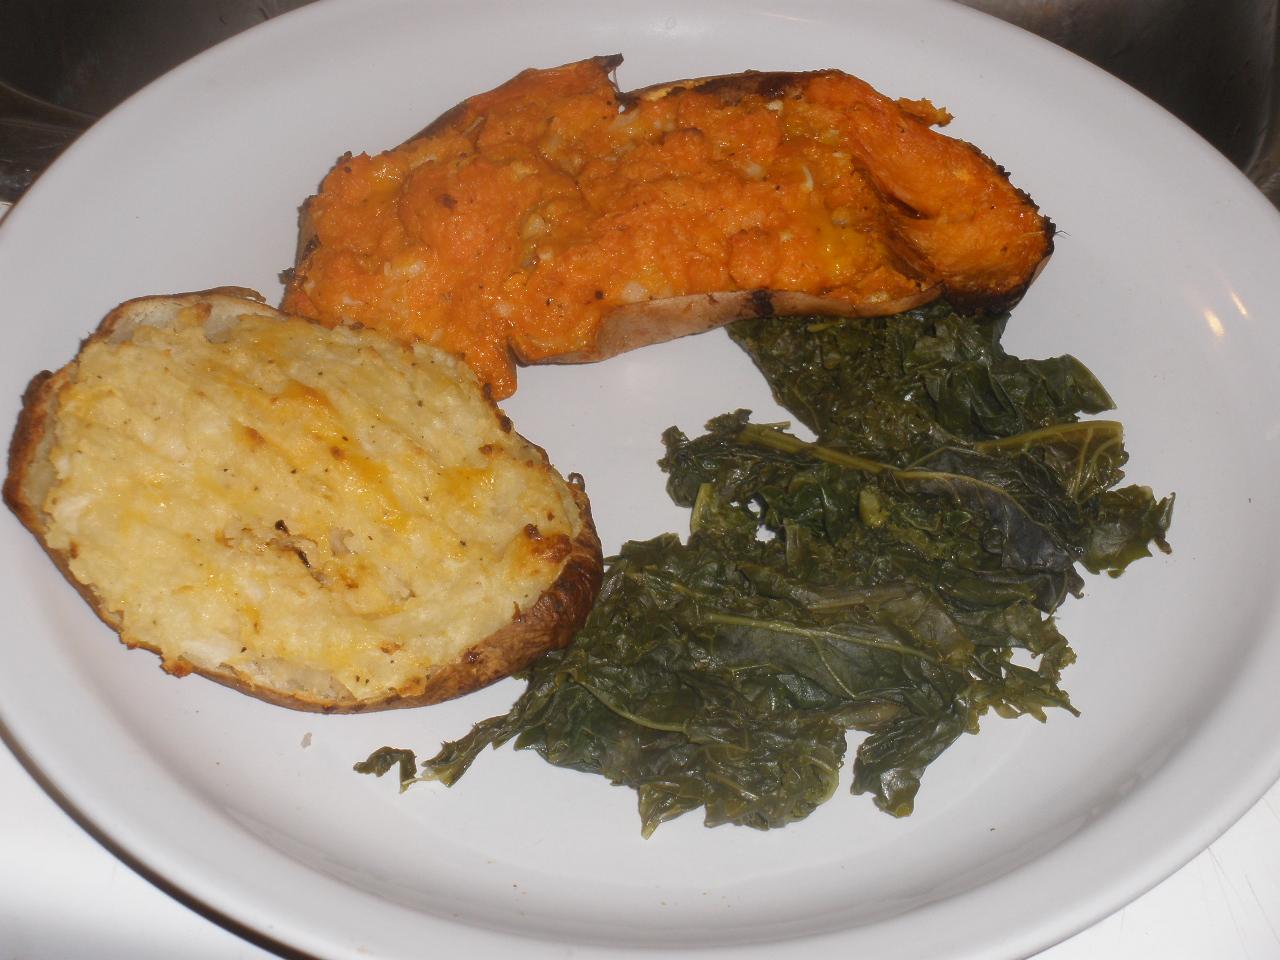 Baked potato and sweet potato, with kale